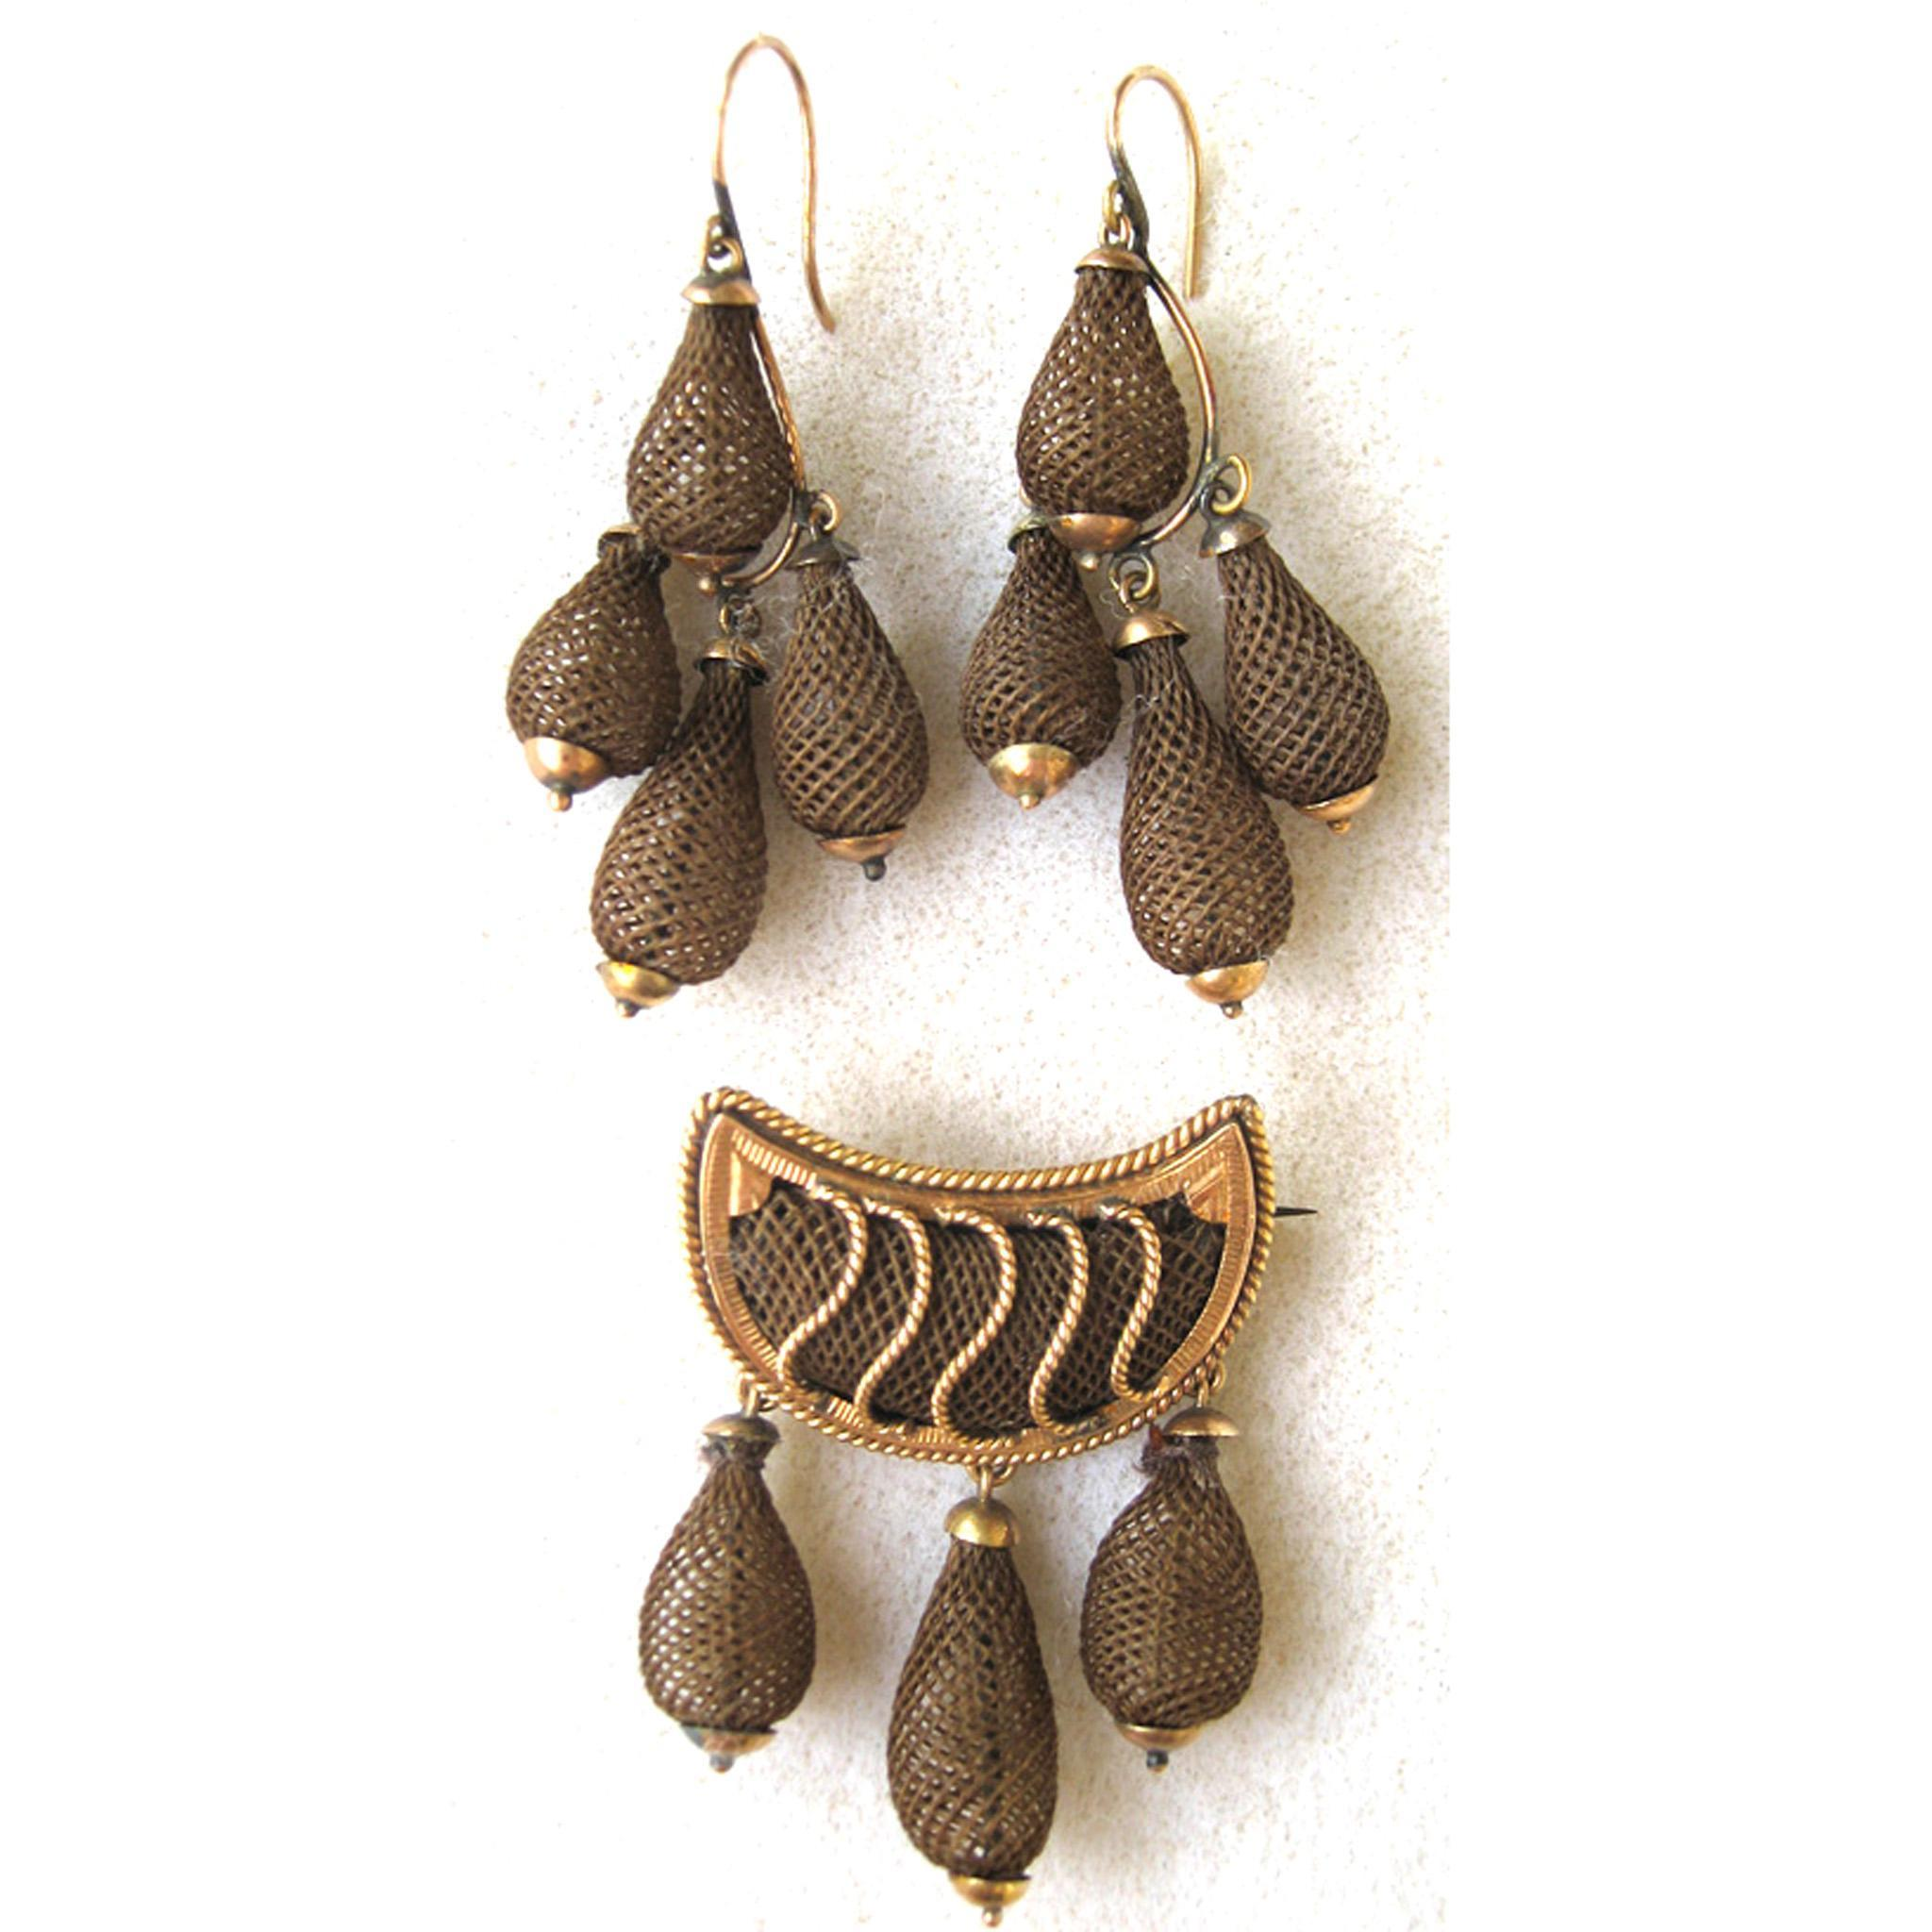 Victorian 14K Yellow Gold Hair Jewelry Set: Brooch/Pin Earrings